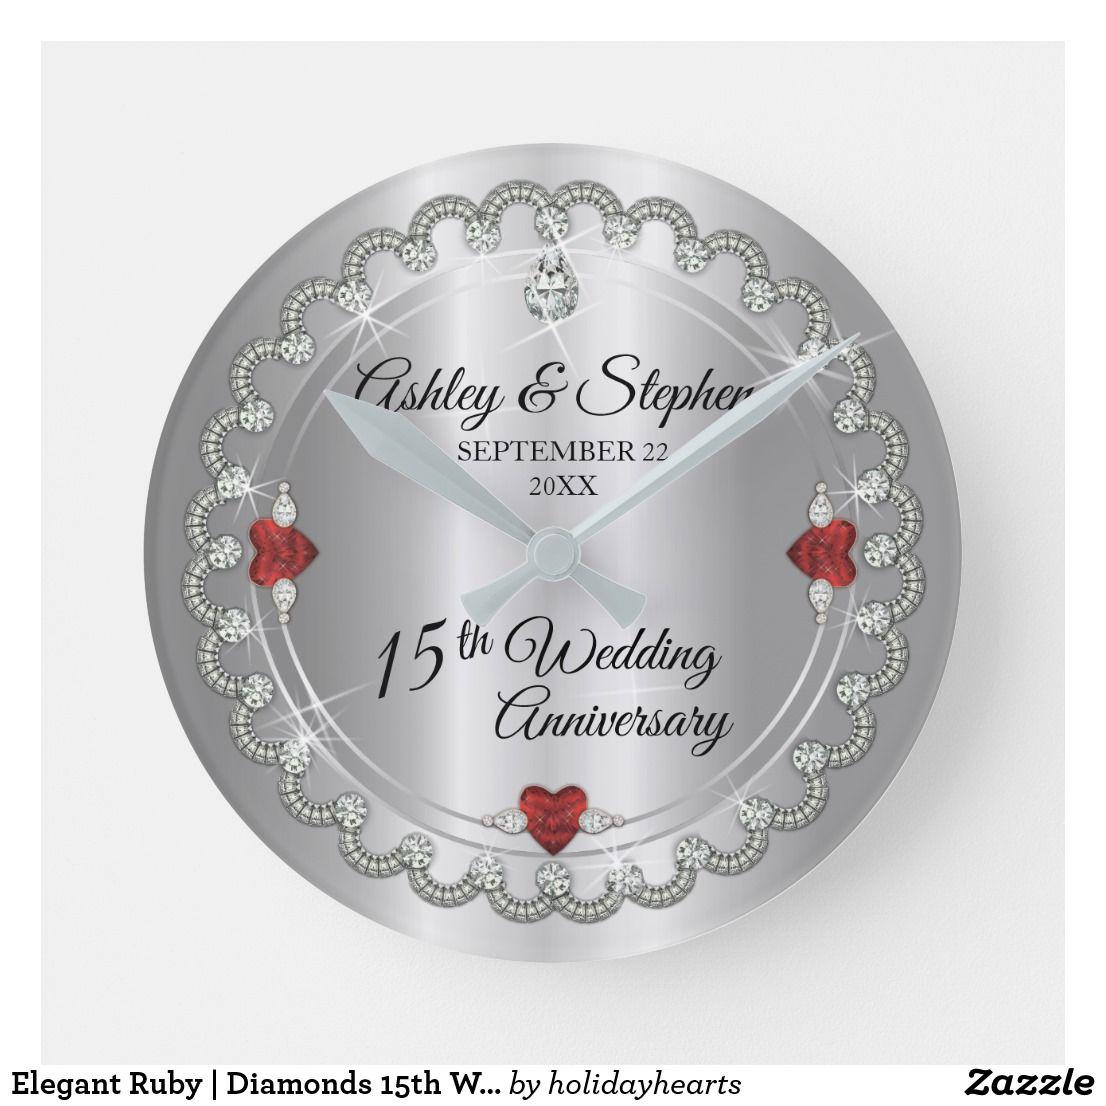 Elegant Ruby Diamonds 15th Wedding Anniversary Round